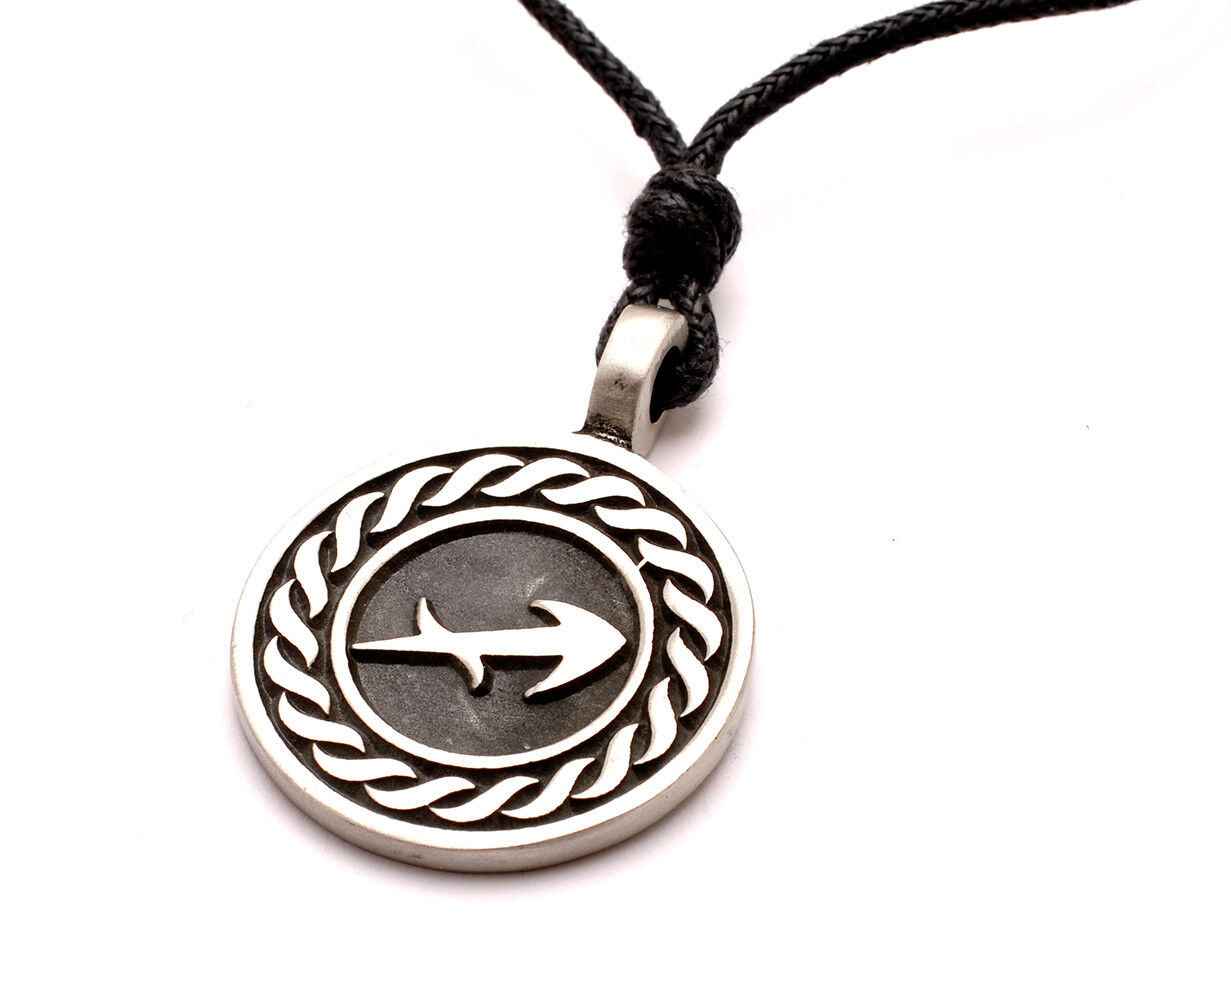 Astrology Necklace Pendant Zodiac Horoscope Jewelry Quality Fine Silver Pewter